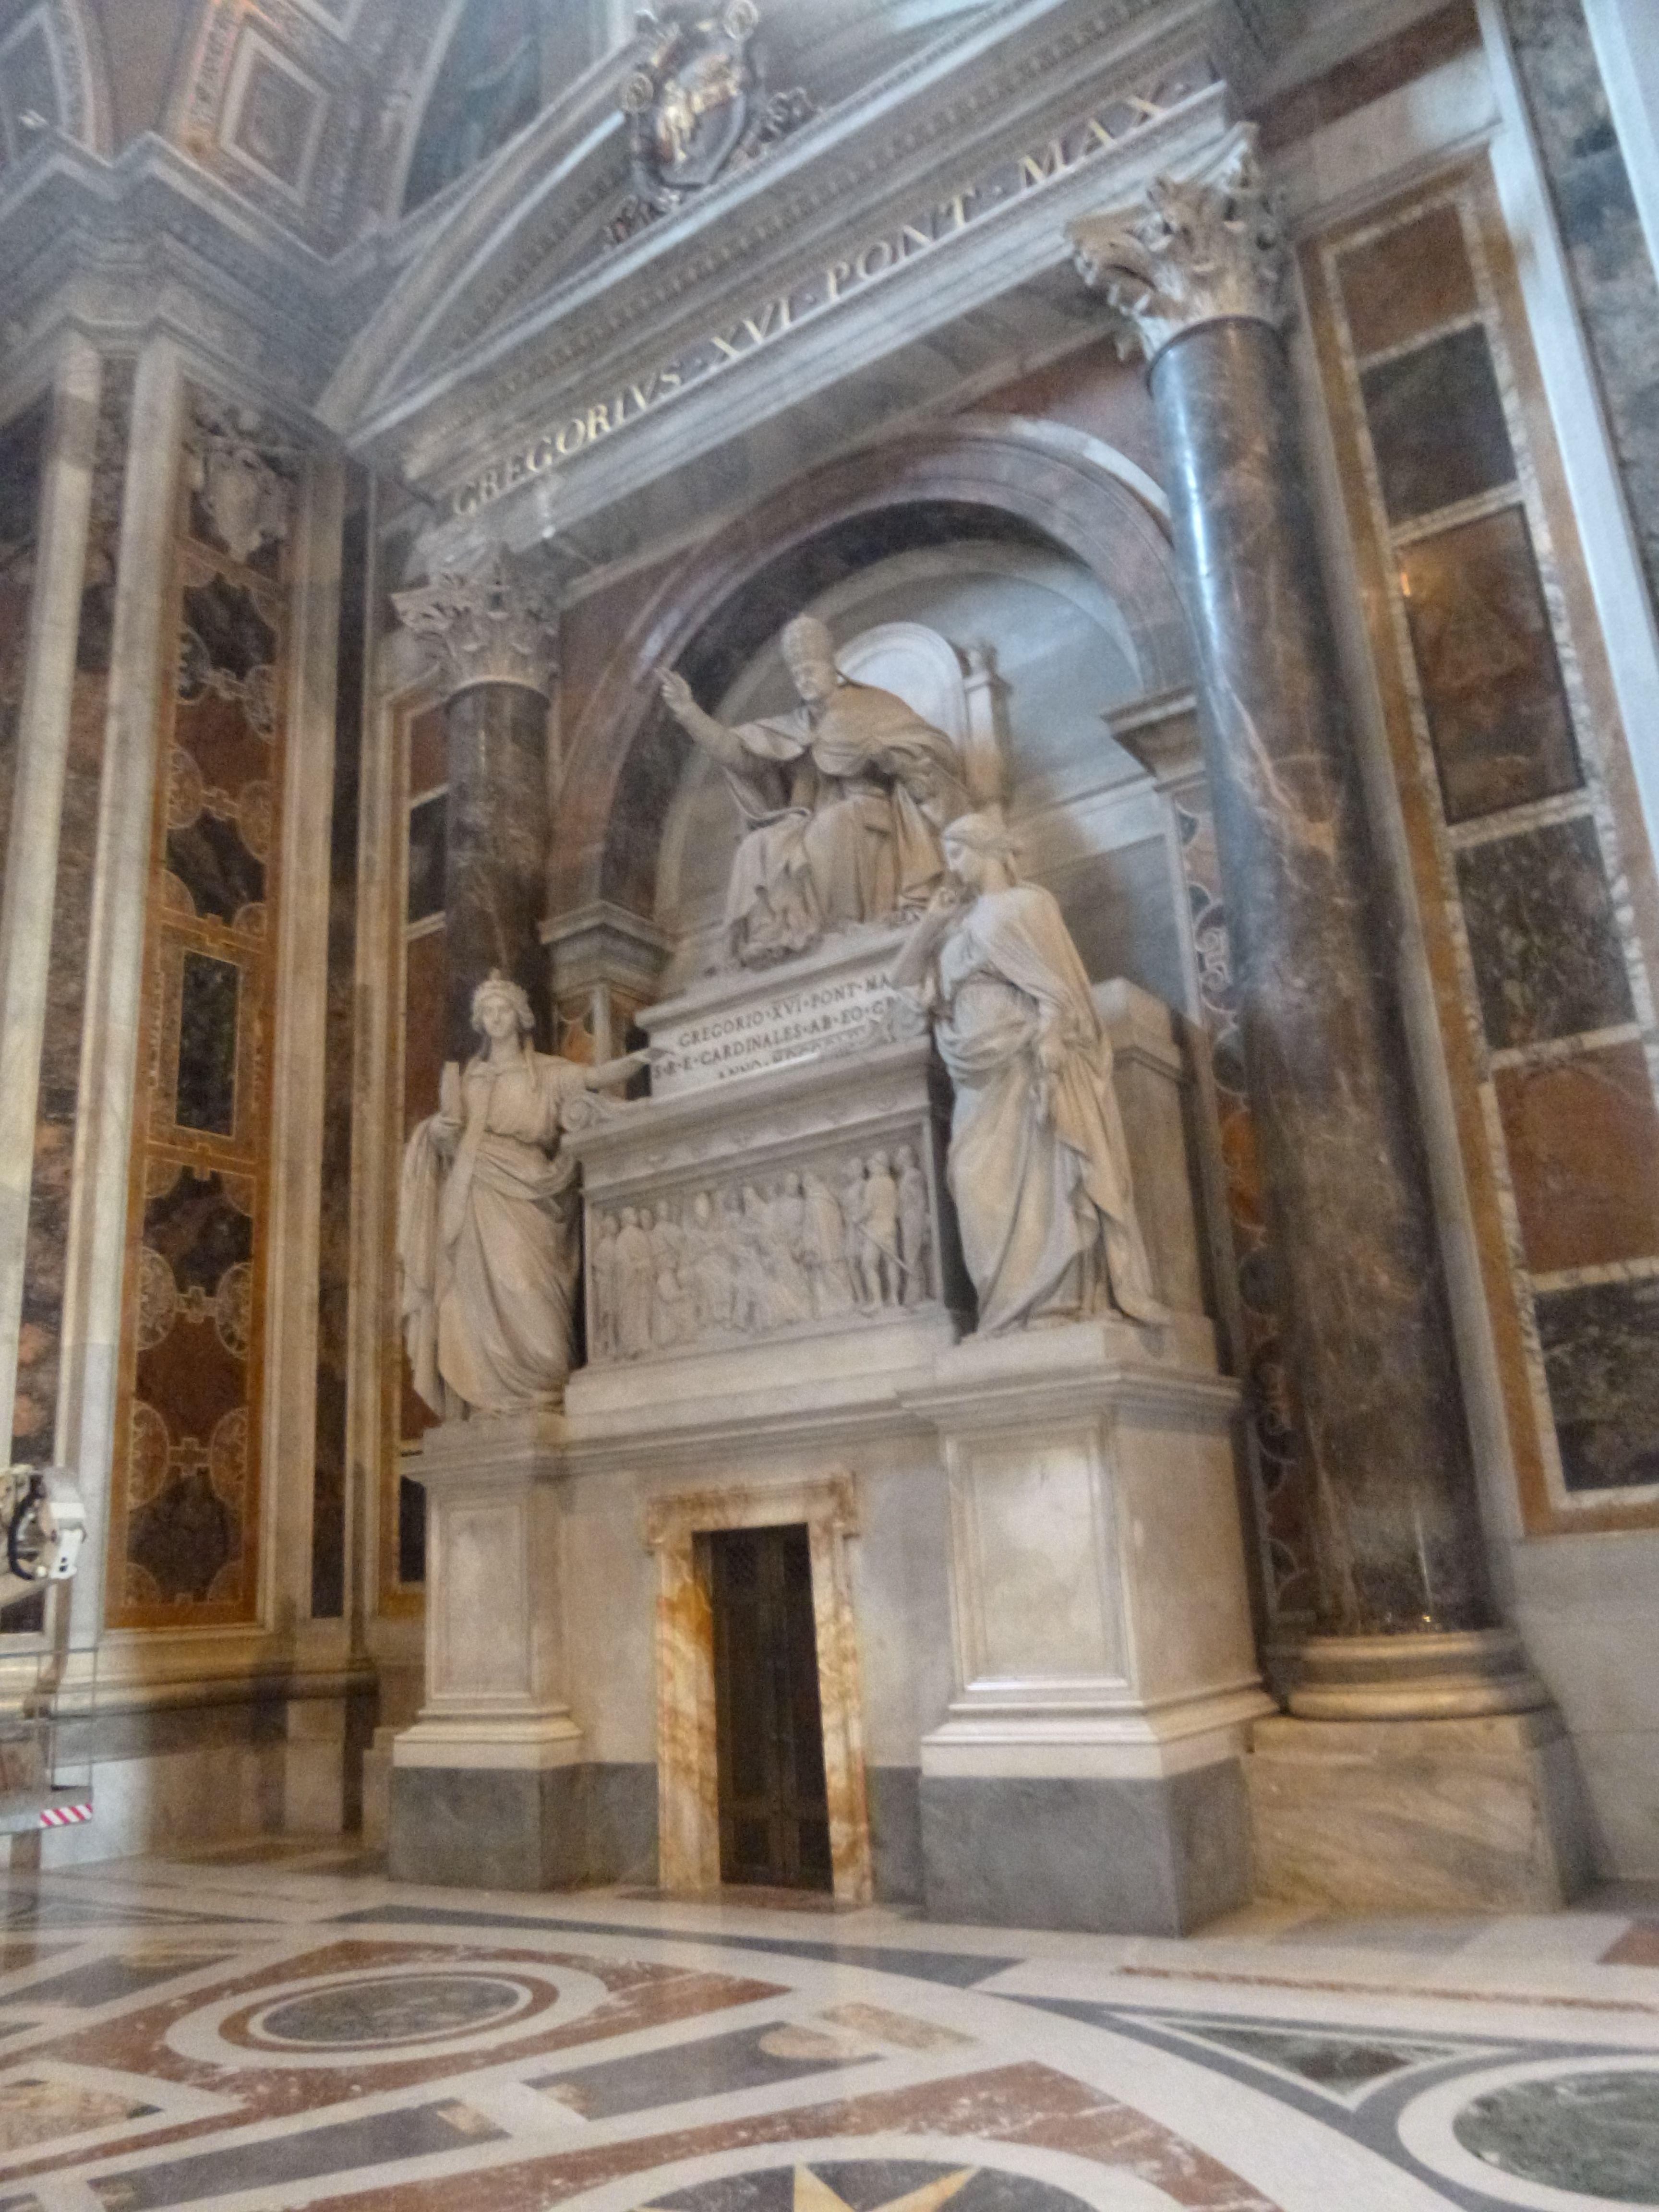 Inside St. Peter's Basilica Vatican City